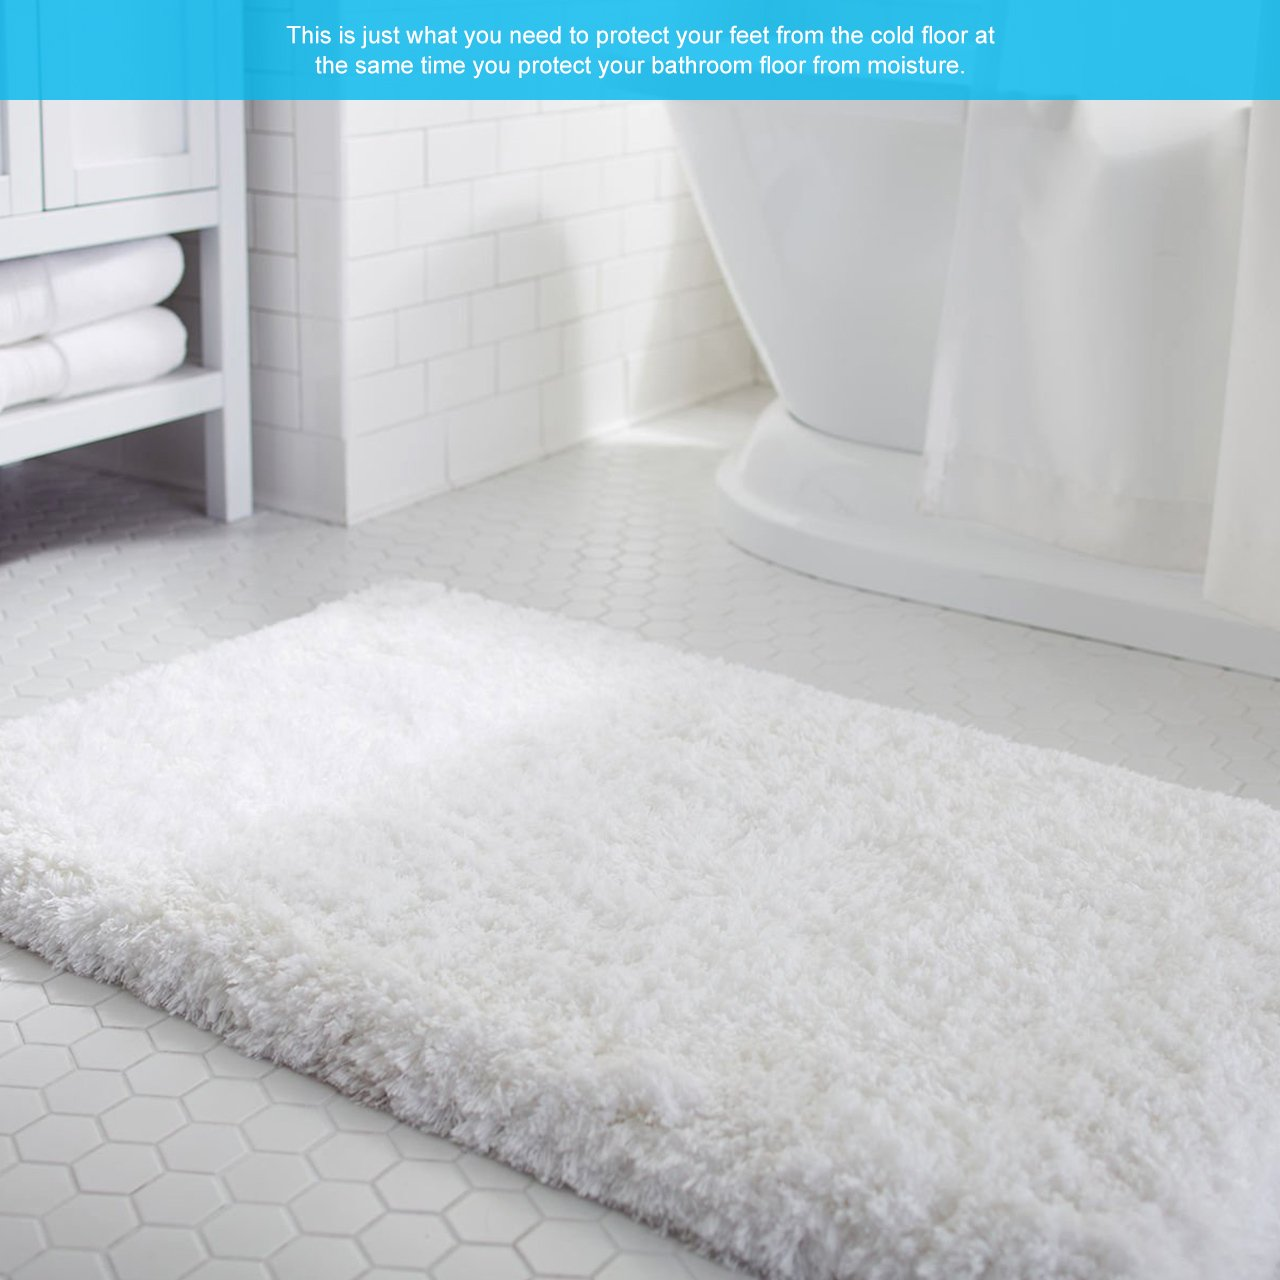 Corridor Sitting Room Kitchen Bathroom White, 20 x 31 LIVINGbasics Microfiber Anti-Slip Bathmat Bathroom Rugs Living Room Extra Fluffy High Absorbent Doormat Floor Rug for for Bedroom Car Seats